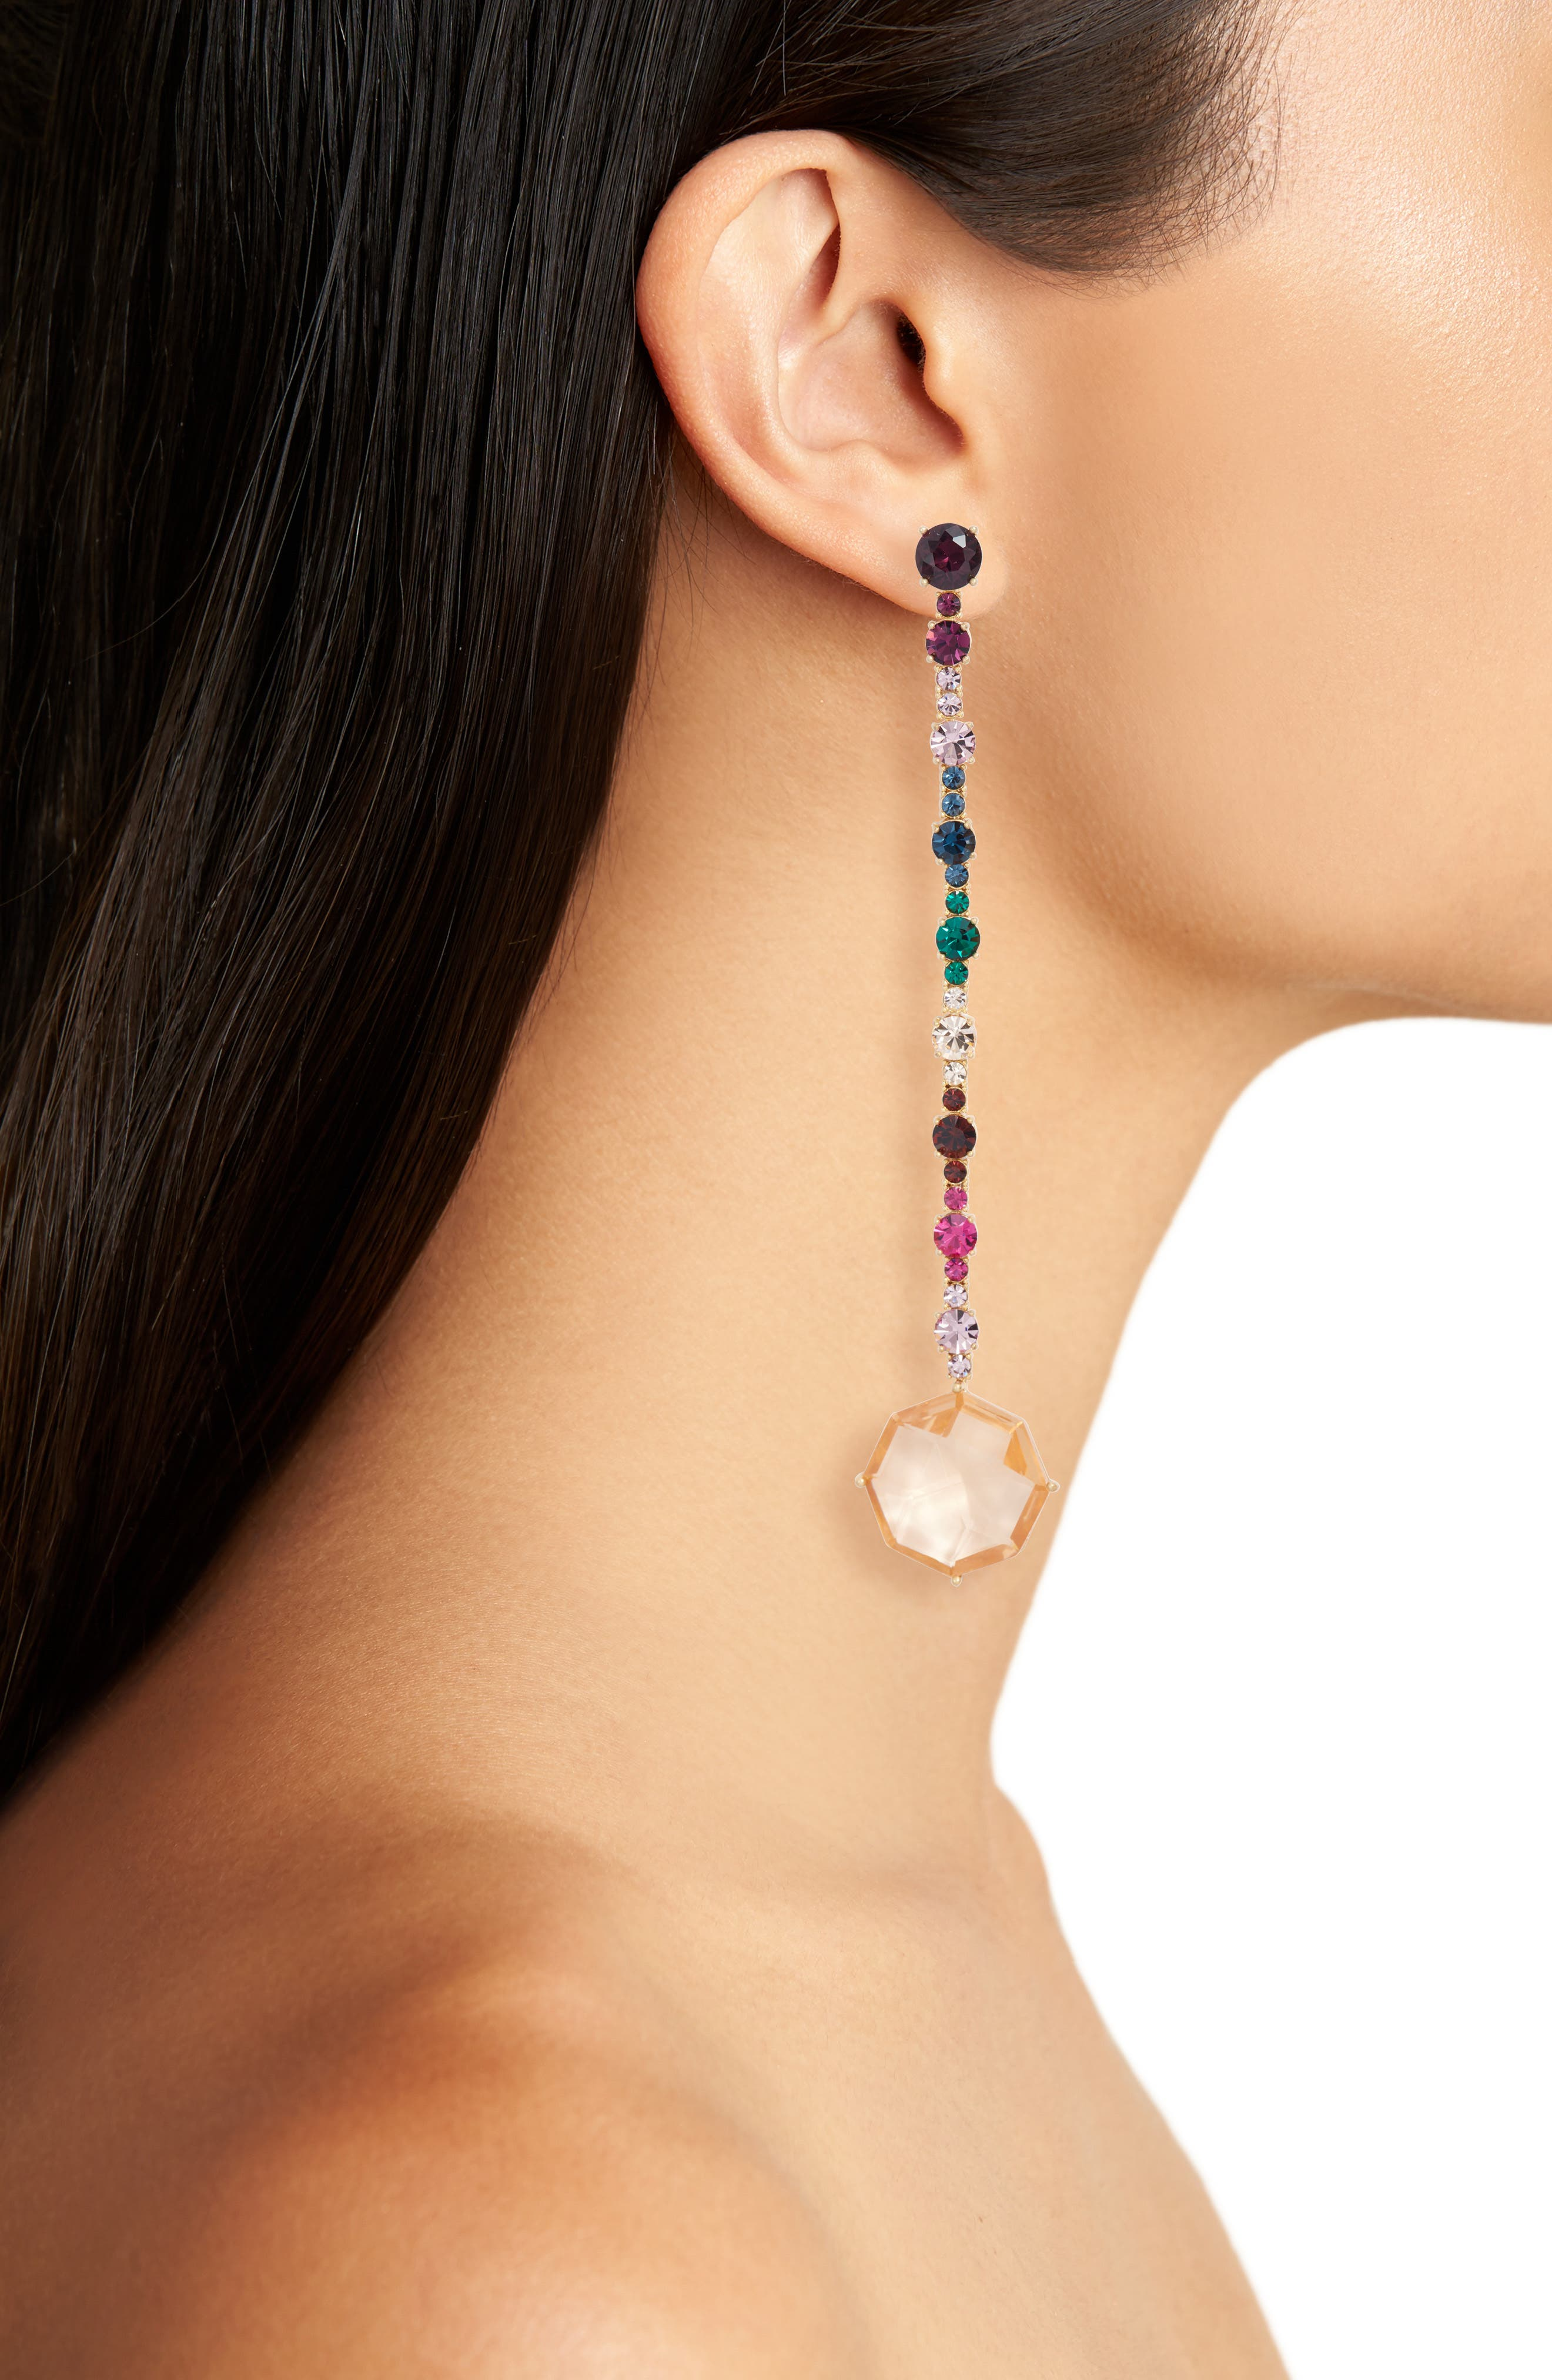 KATE SPADE NEW YORK,                             crystal statement linear drop earrings,                             Alternate thumbnail 2, color,                             GOLD MULTI